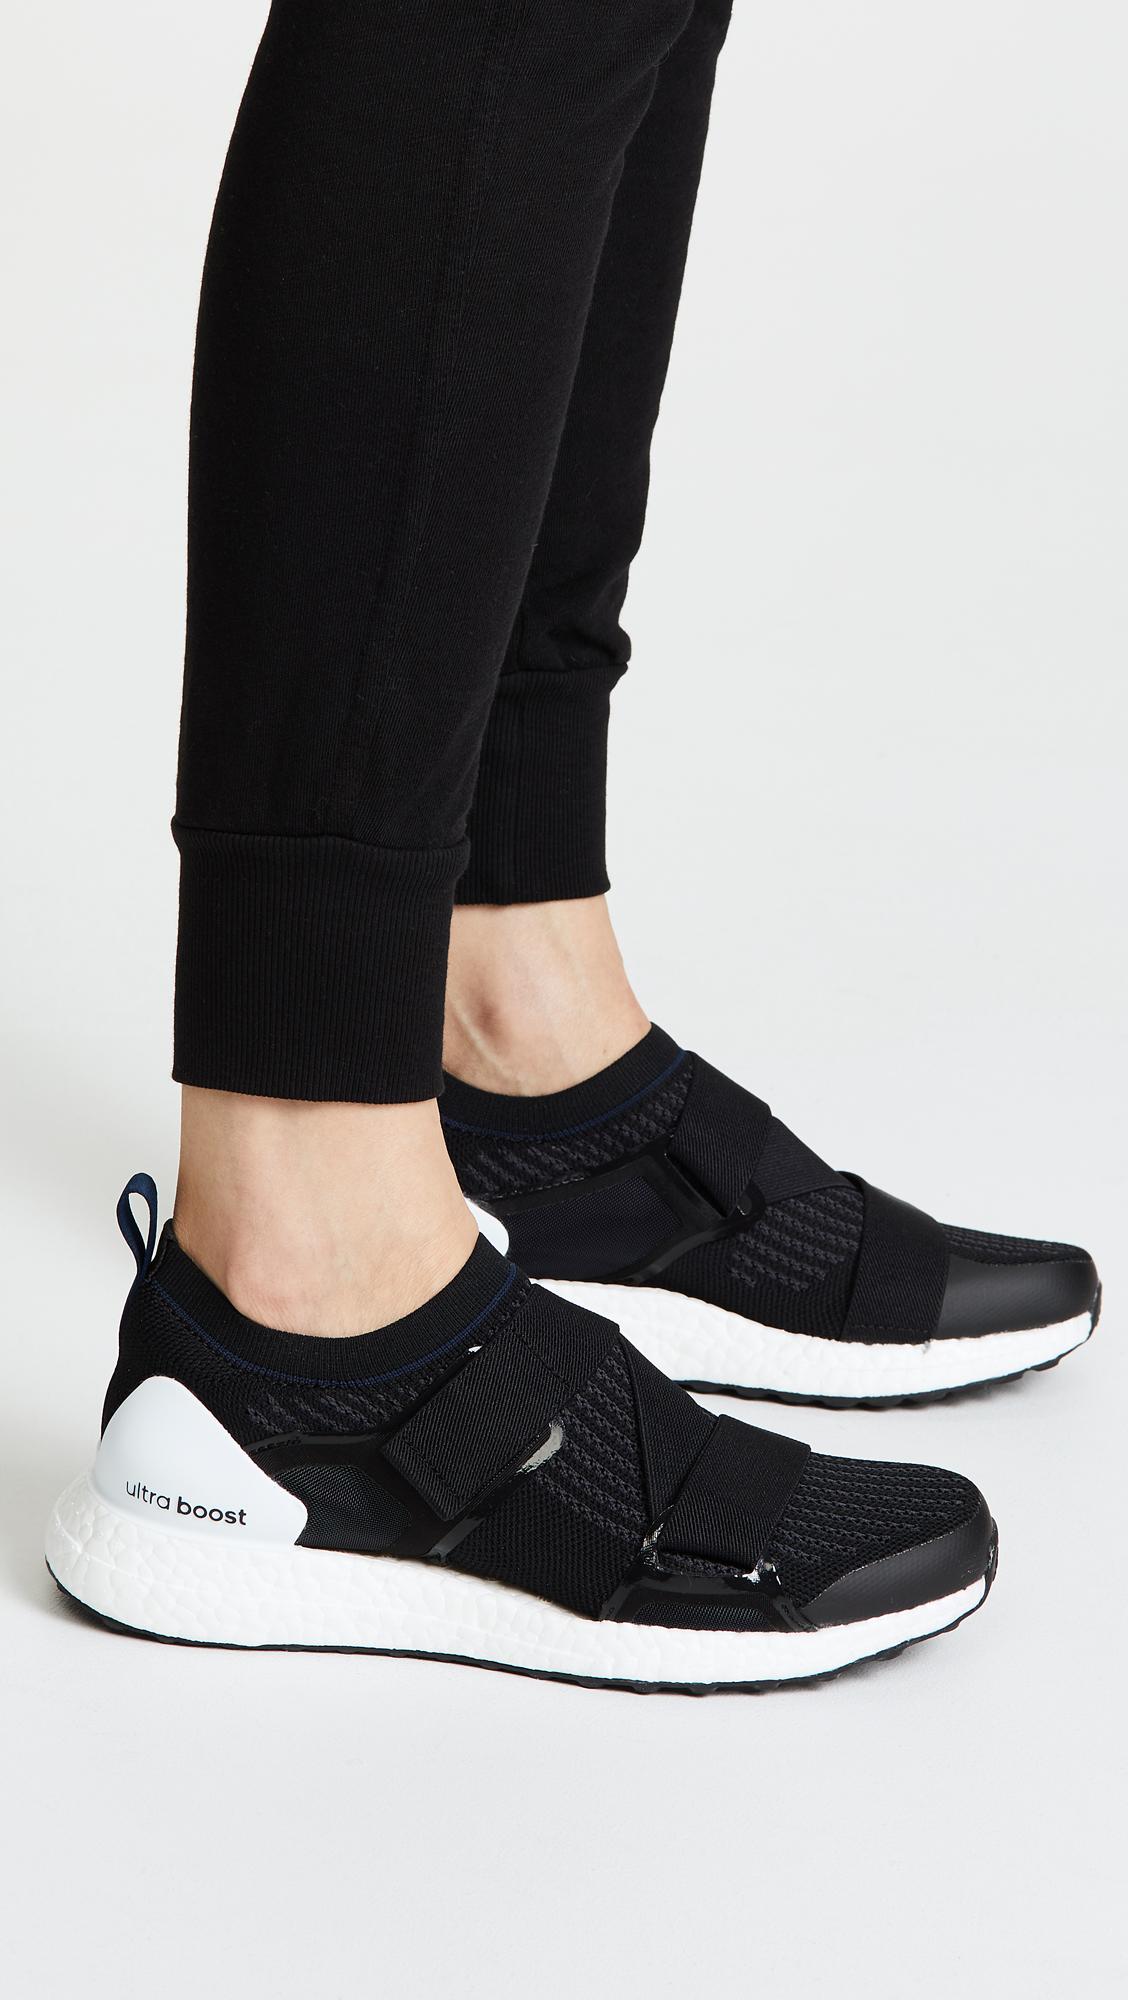 3a855f1c80209 adidas by Stella McCartney UltraBOOST X Sneakers